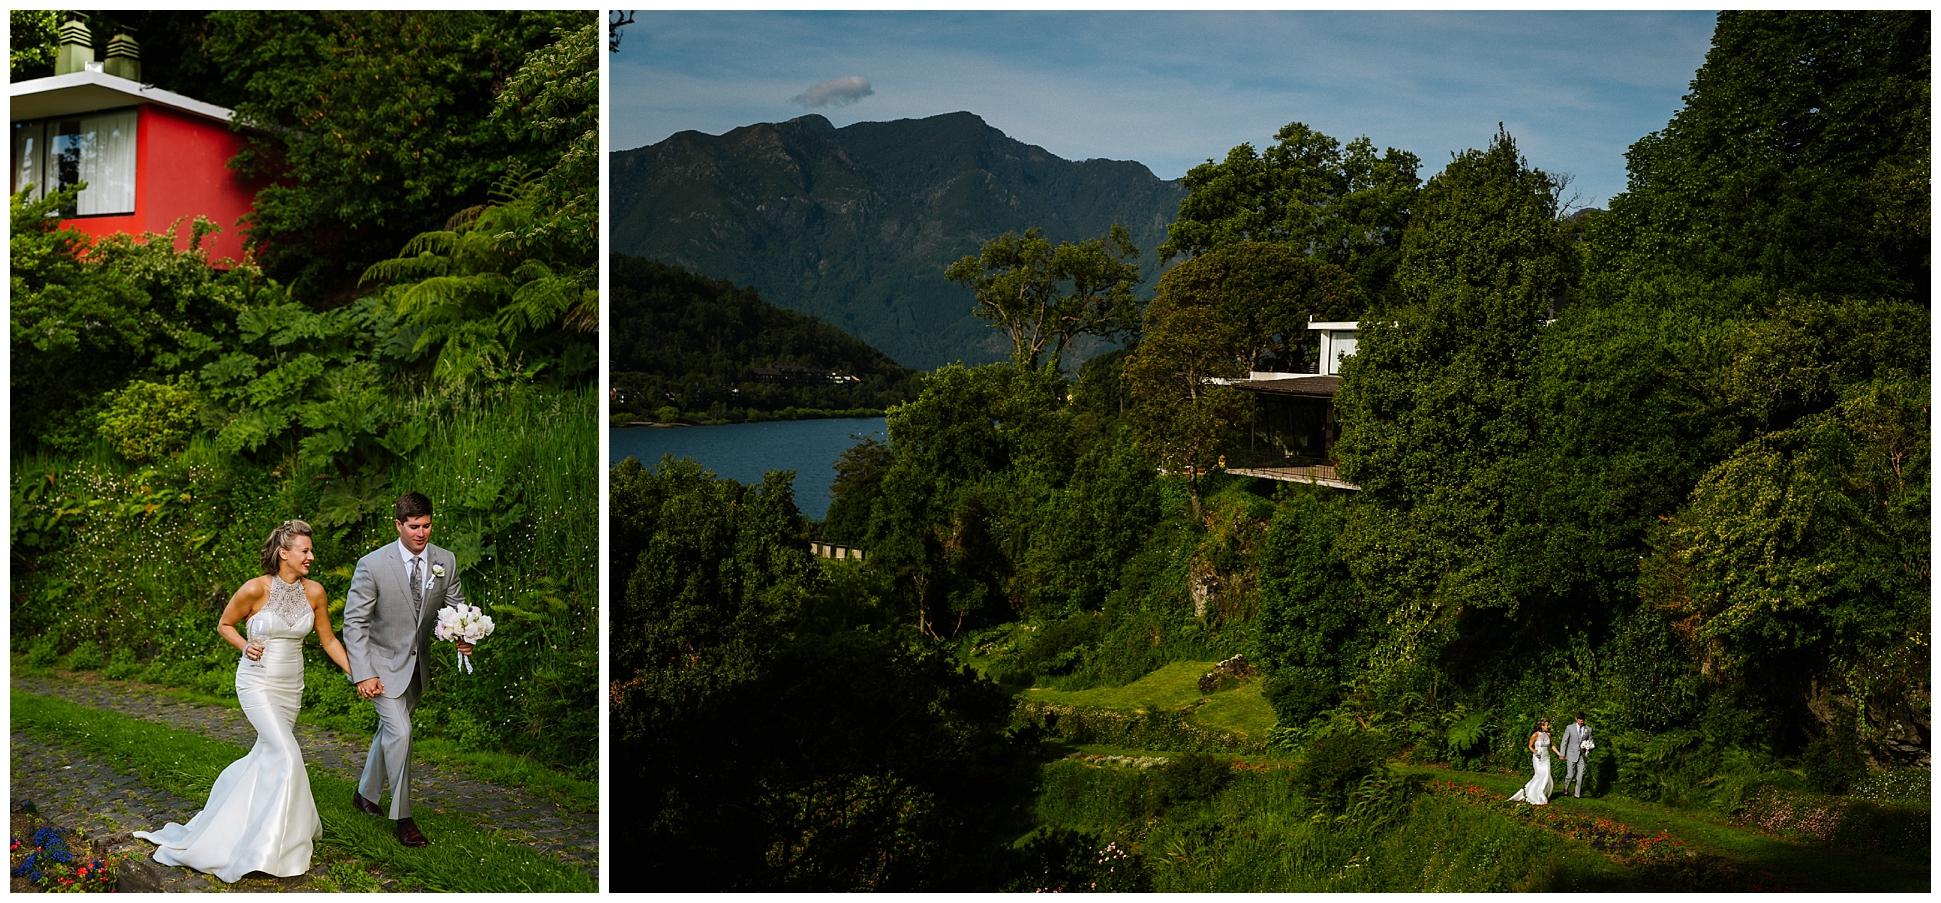 Cheilean-destination-adventure-wedding-florida-patagonia-pucon-santa-cruz-vsco_0113.jpg